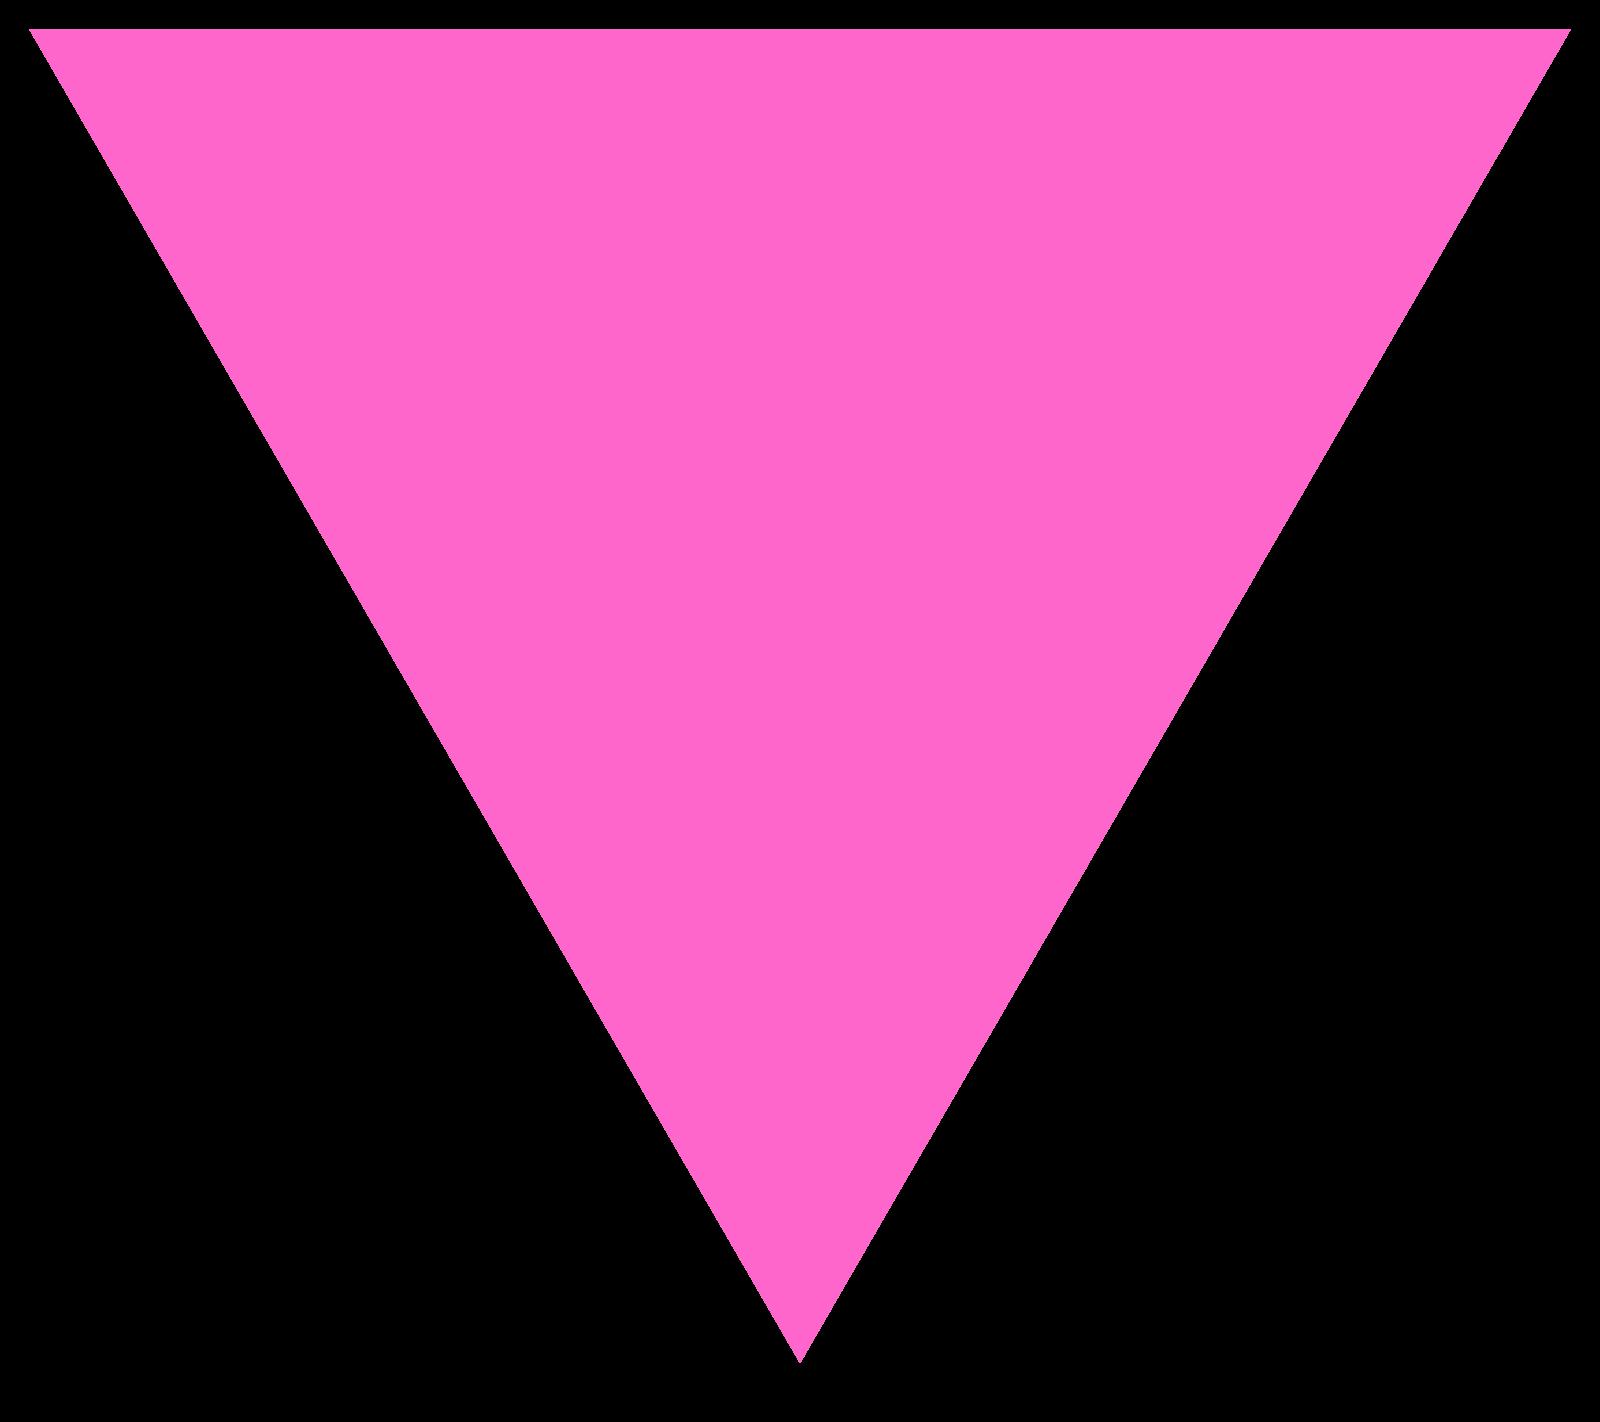 Triangular clipart pink triangle, Triangular pink triangle.